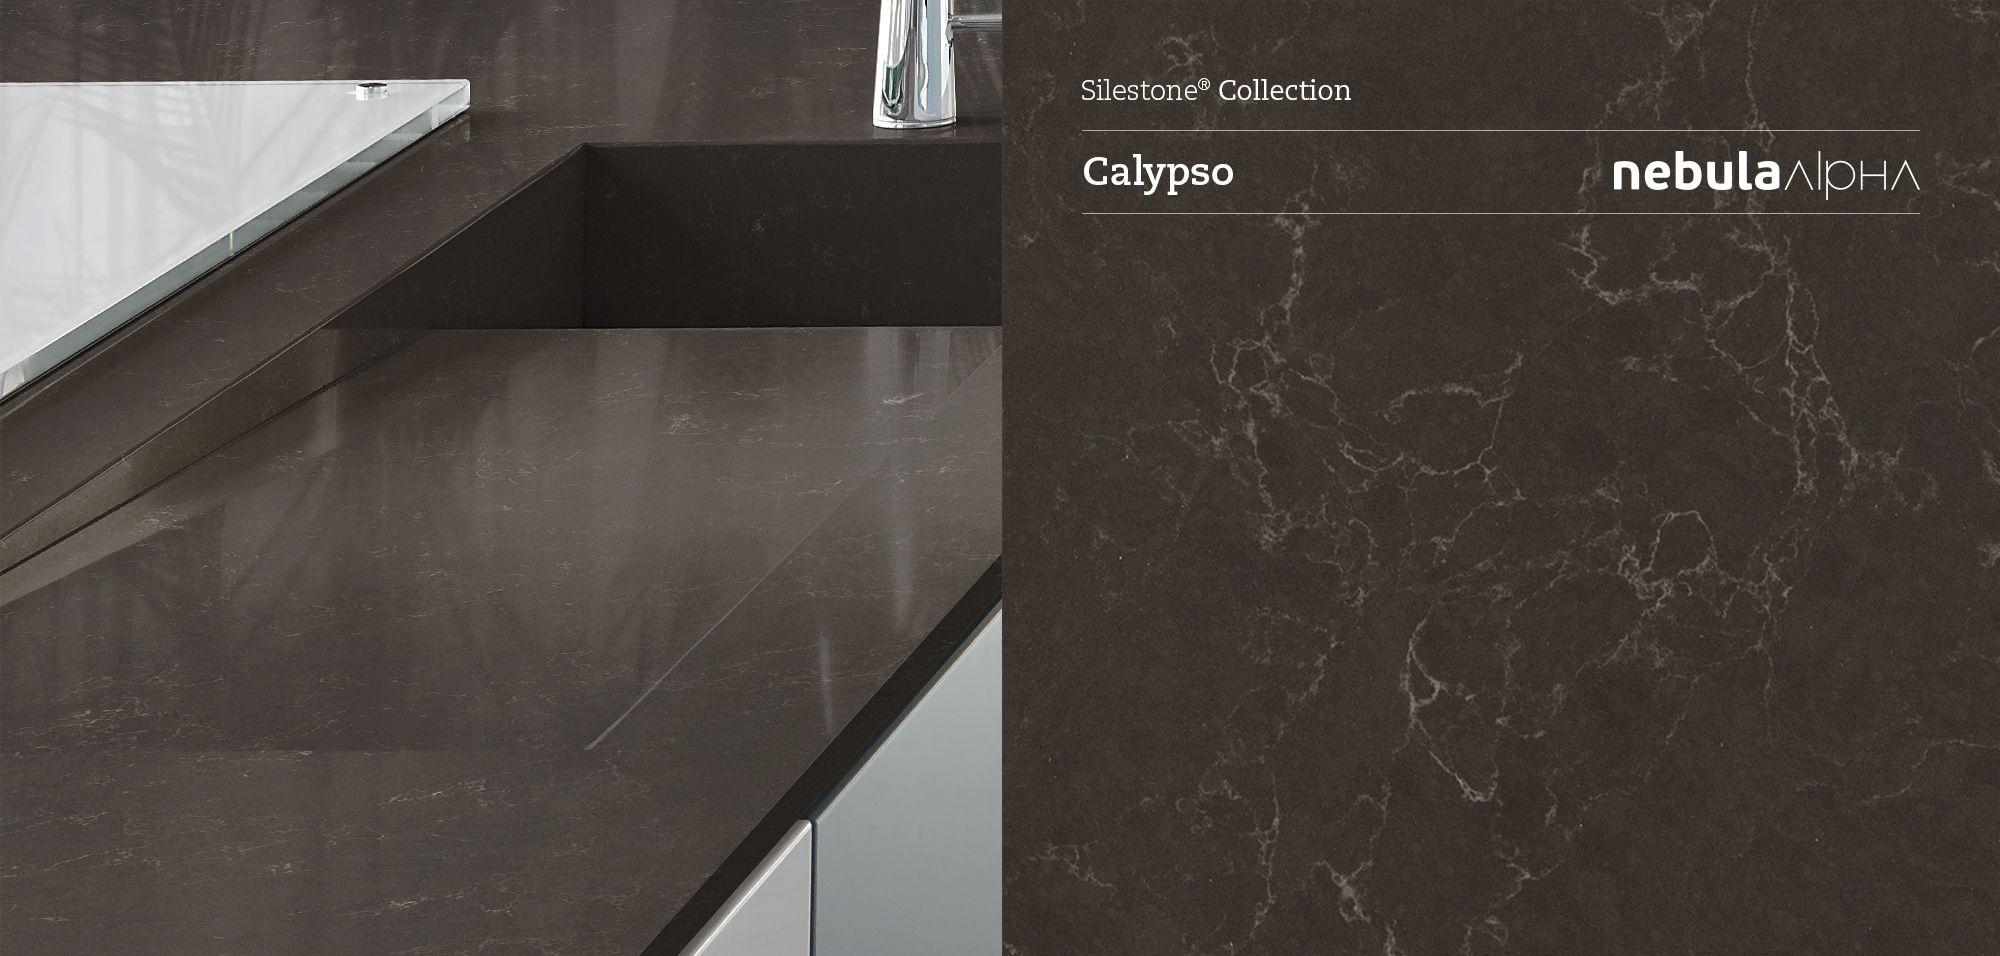 Silestone Calypso Quot Nebula Alpha Series For The Kitchen Island Future Home Pinterest